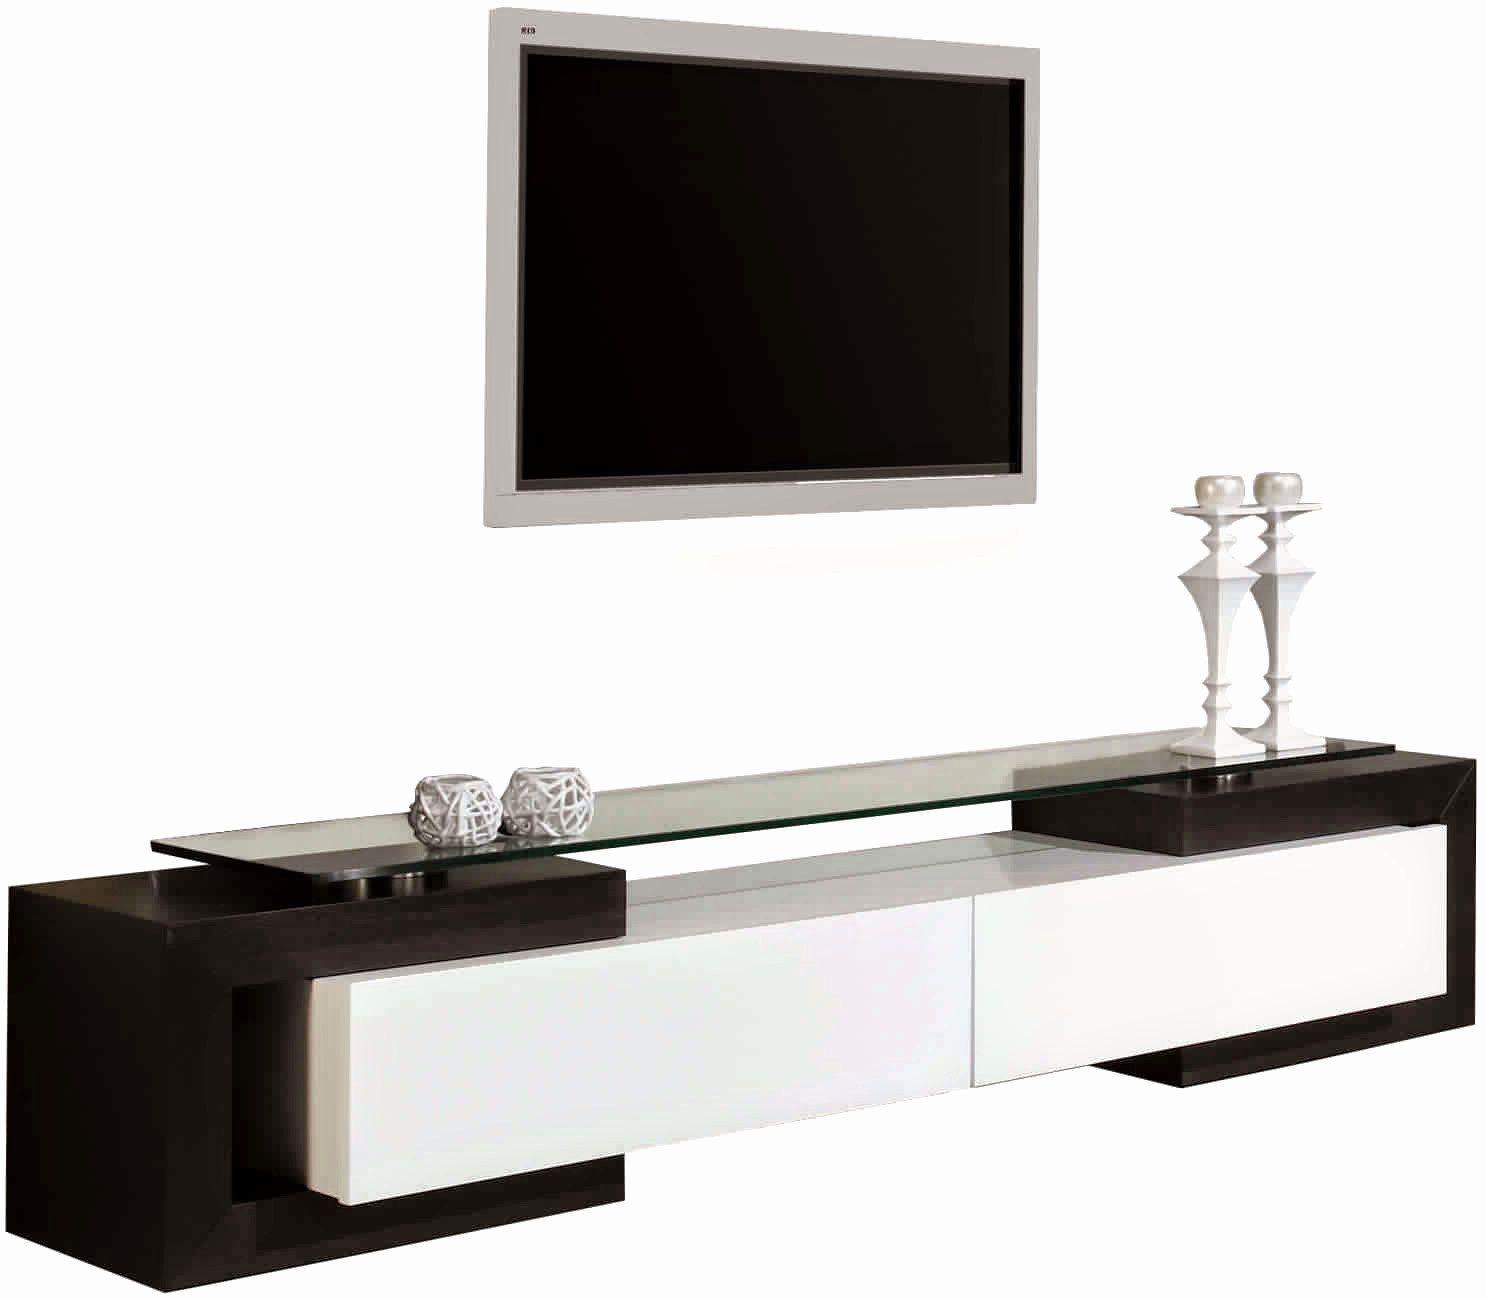 50 Conforama Meuble Tele Check More At Https Leonstafford Com Conforama Meuble Tele Television Tables Design Kitchen Design